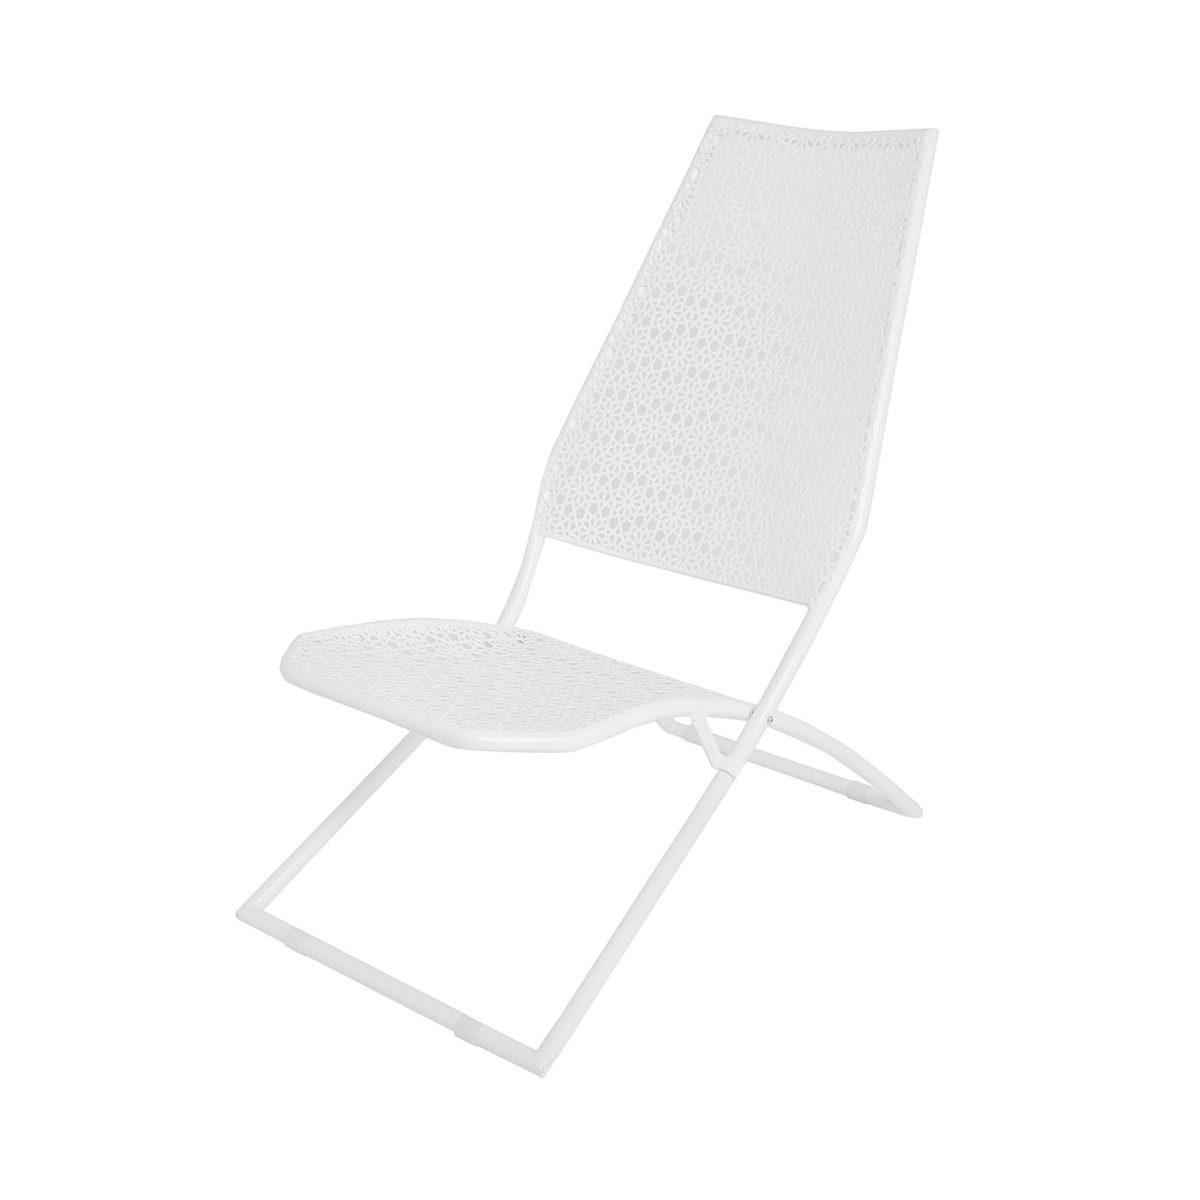 catalogo-coincasa-estate-2019-sedia-spiaggia